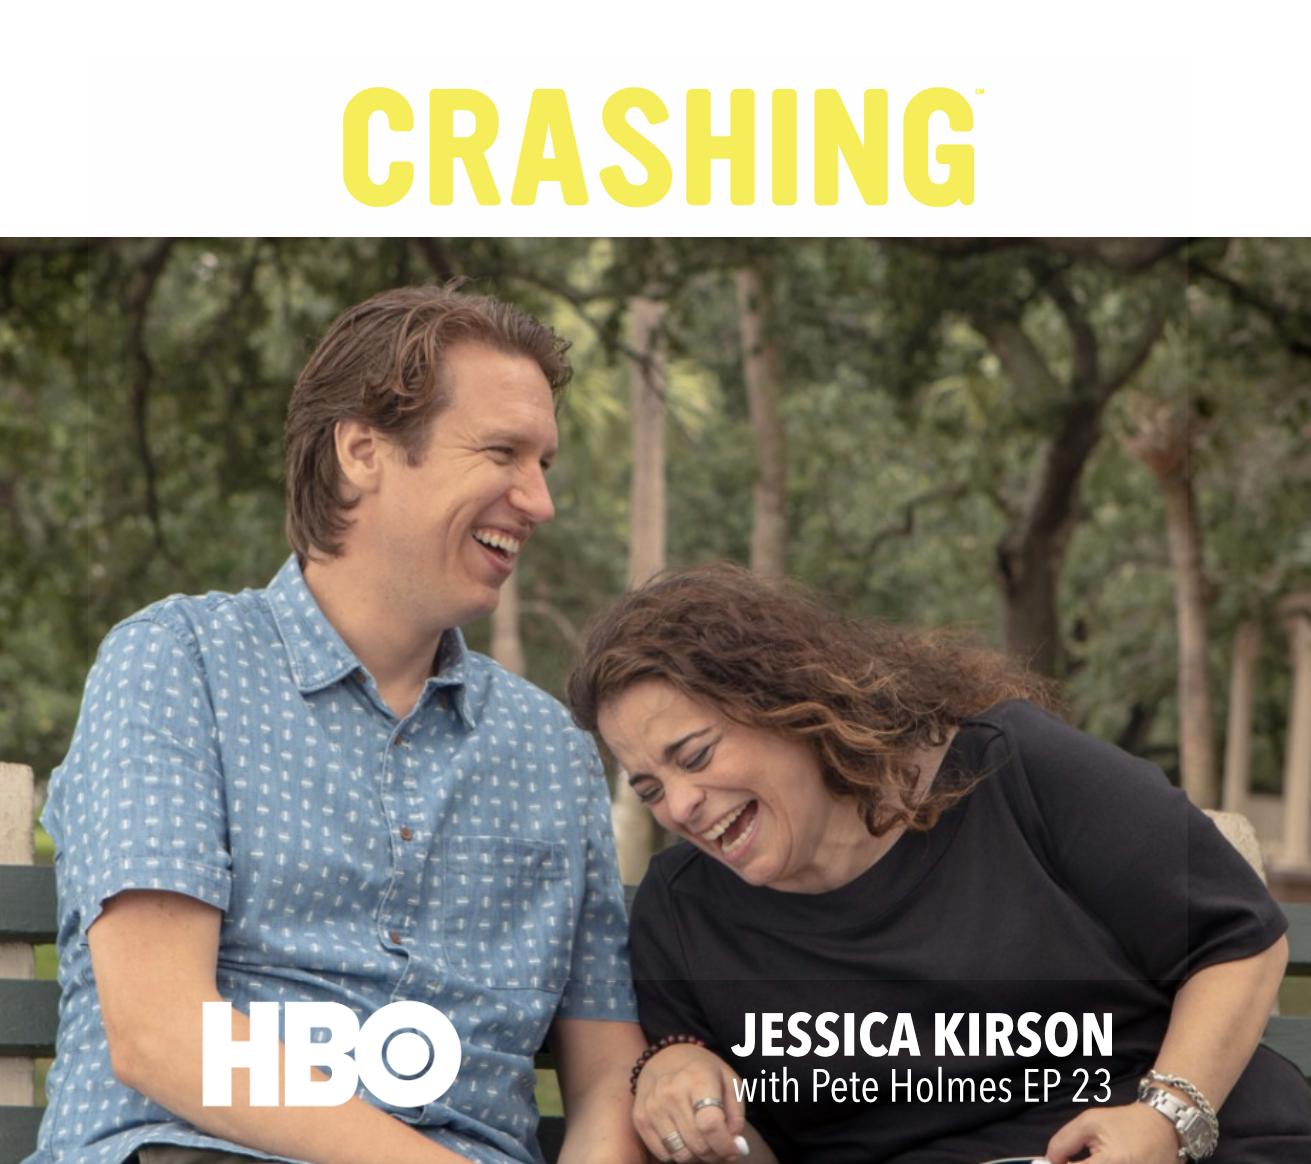 Jessica-Kirson-crashing-square.png